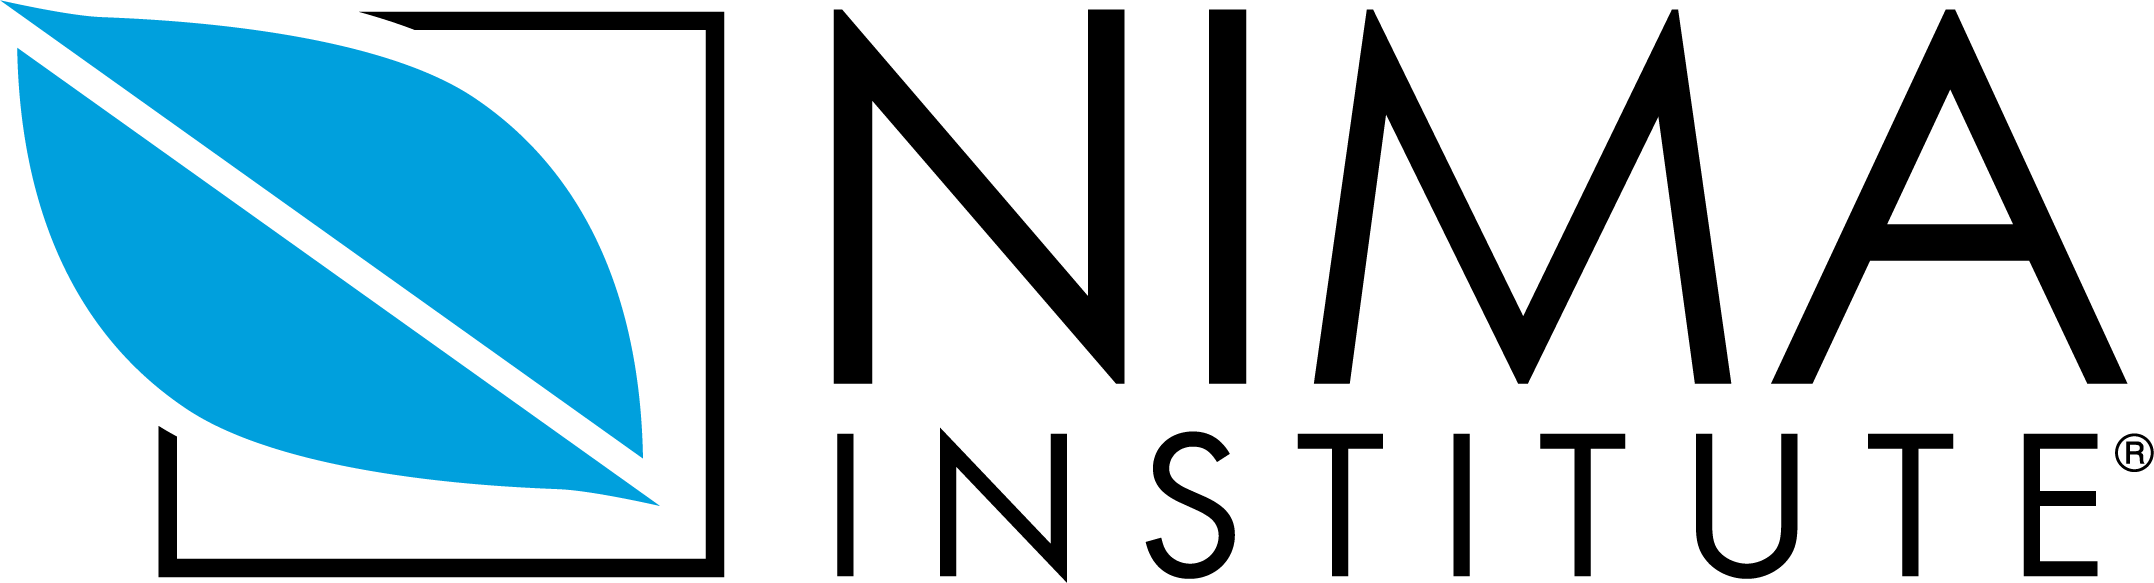 National Institute of Medical Aesthetics Company Logo